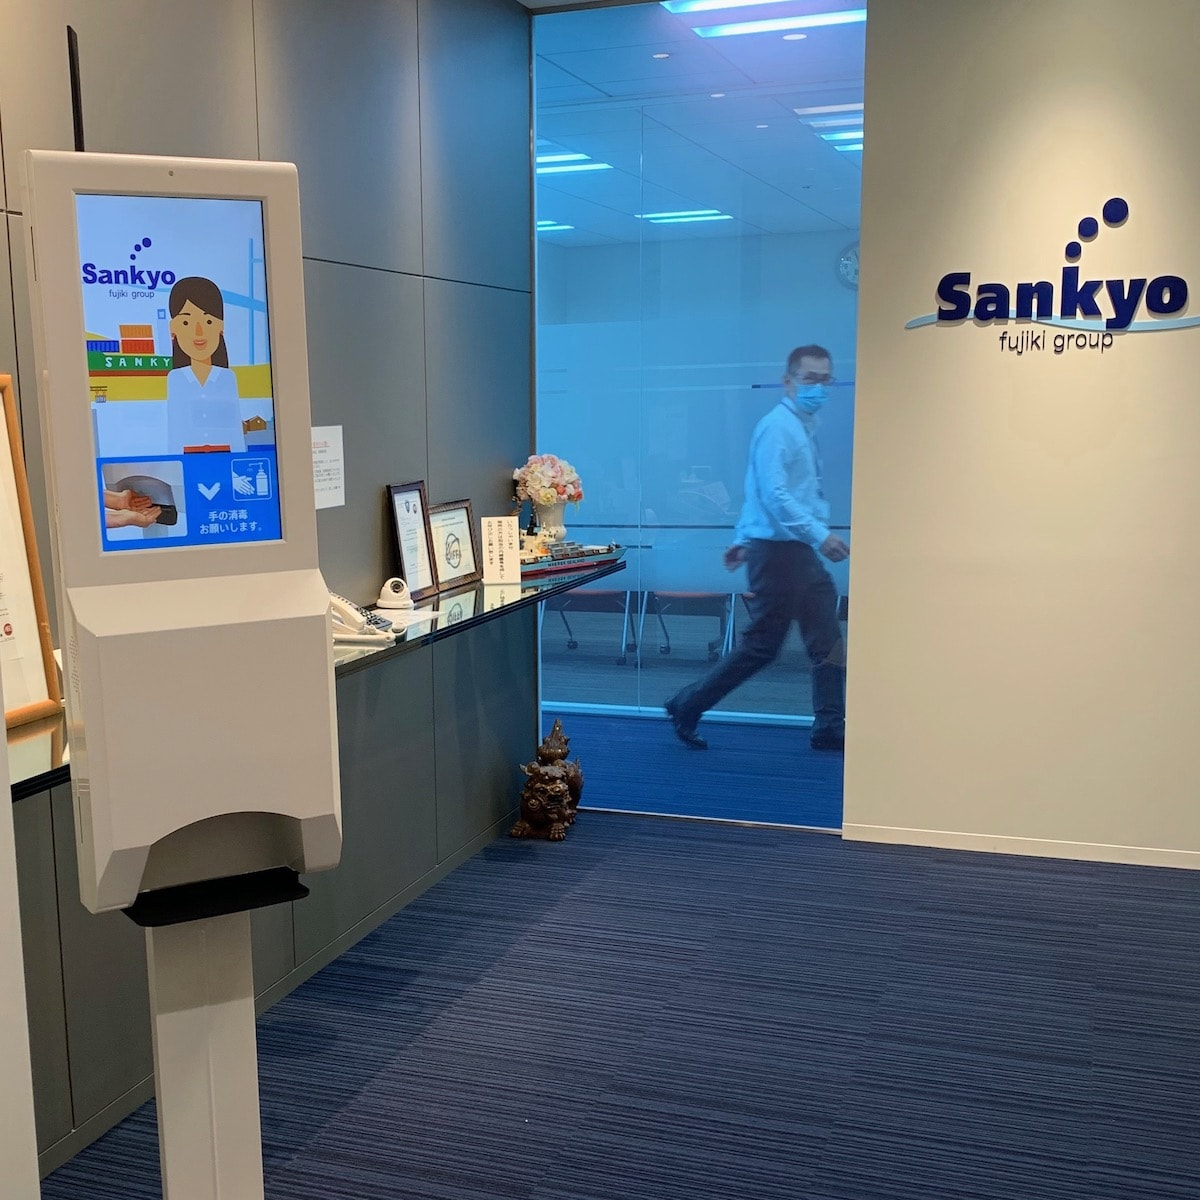 Sankyoでおてがるクリーン